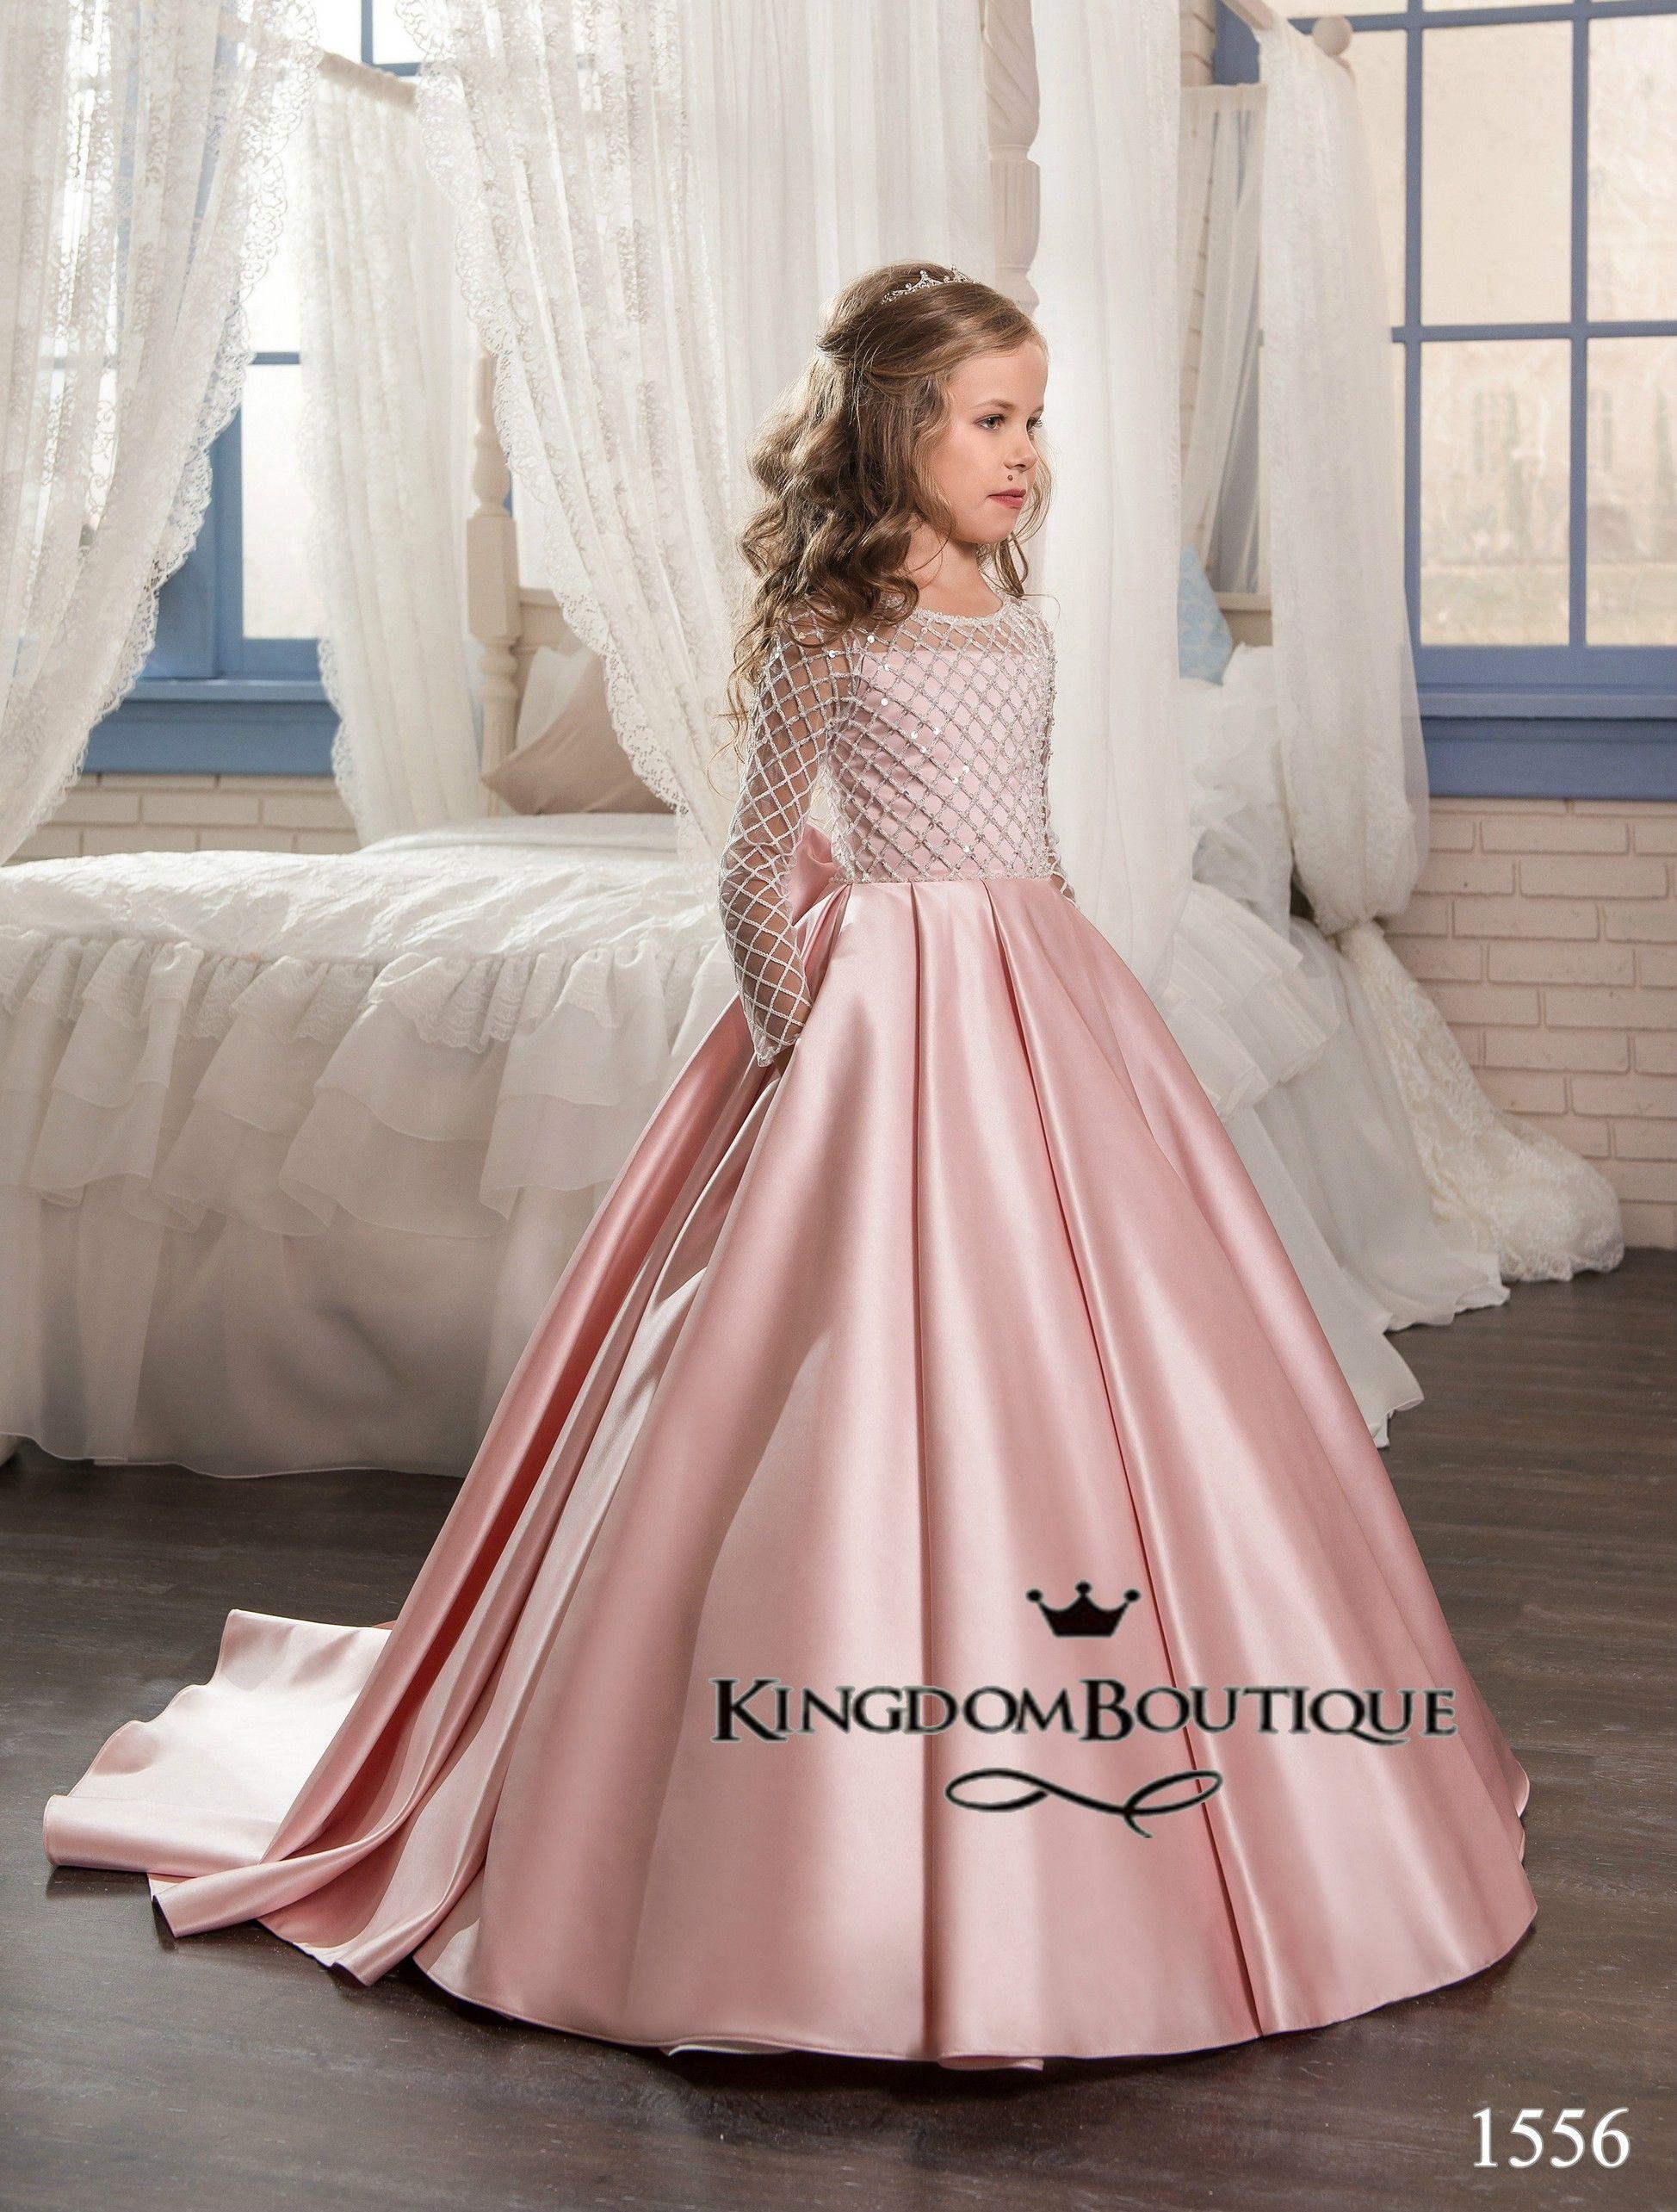 3c9cccfffbe Flower girl dress 16-1556 - kingdom.boutique in 2019